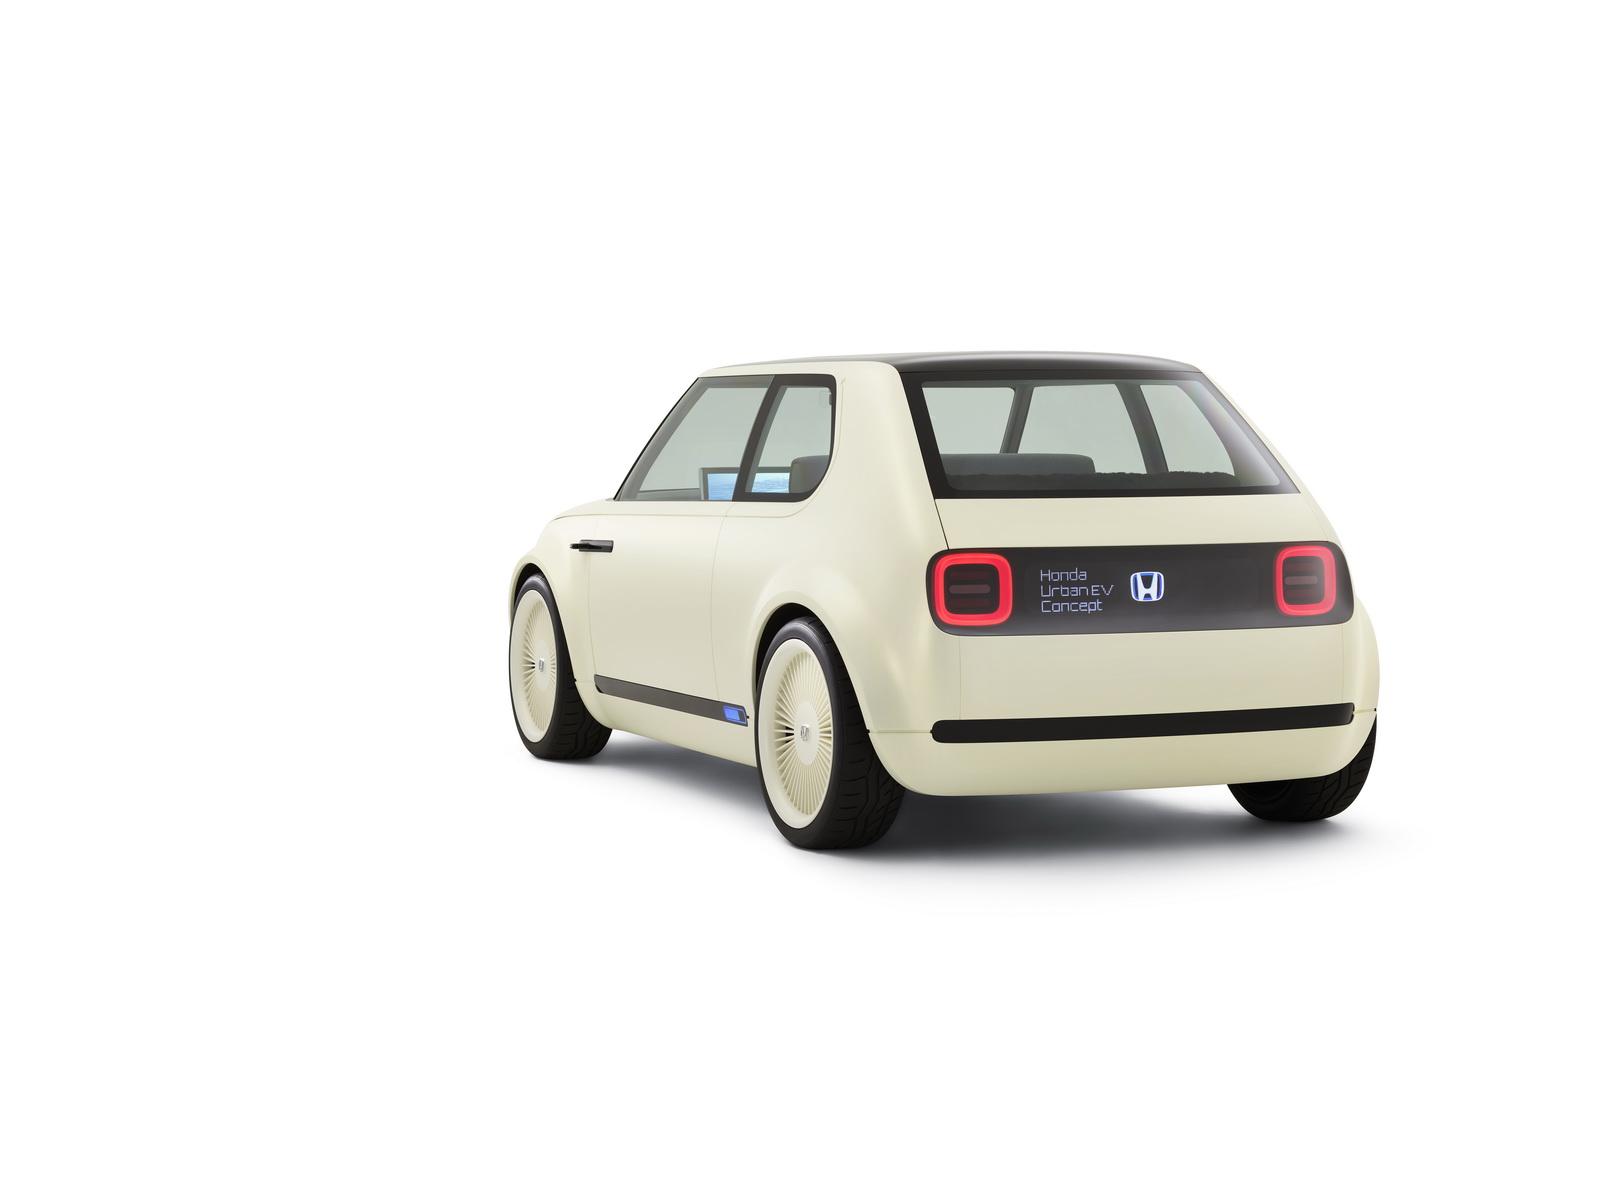 Honda_Urban_EV_Concept_04.jpg